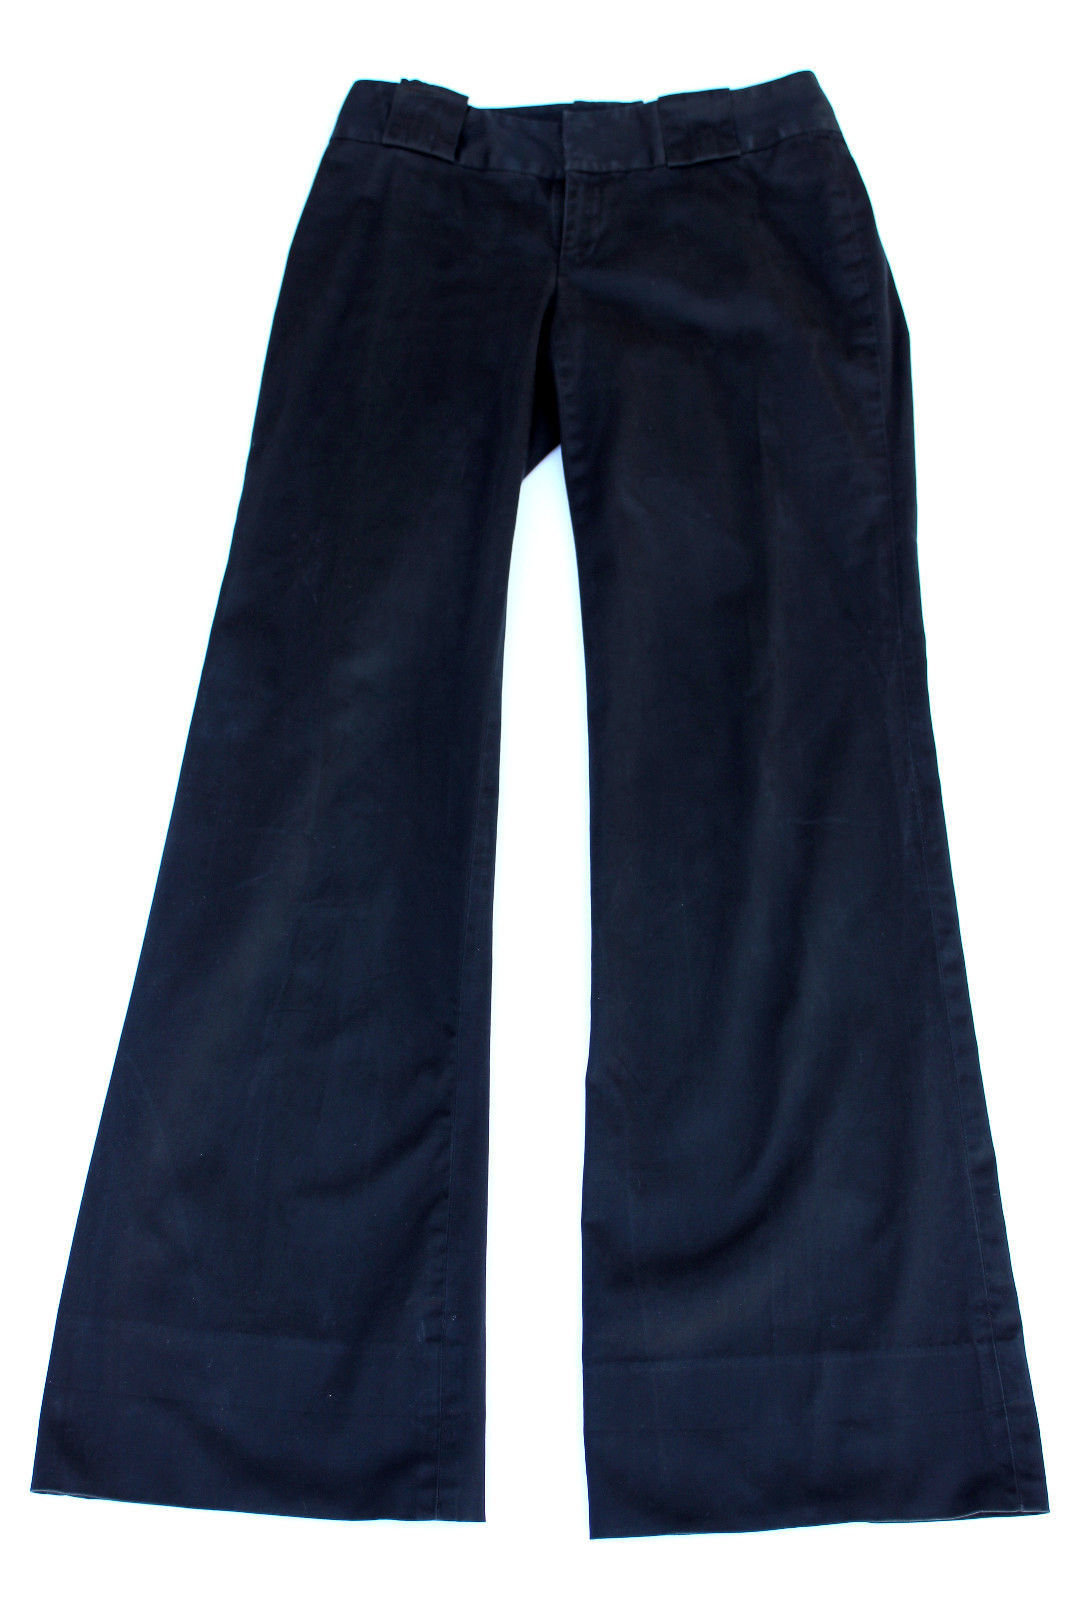 Stretchy black slacks - arifvisitor.ga